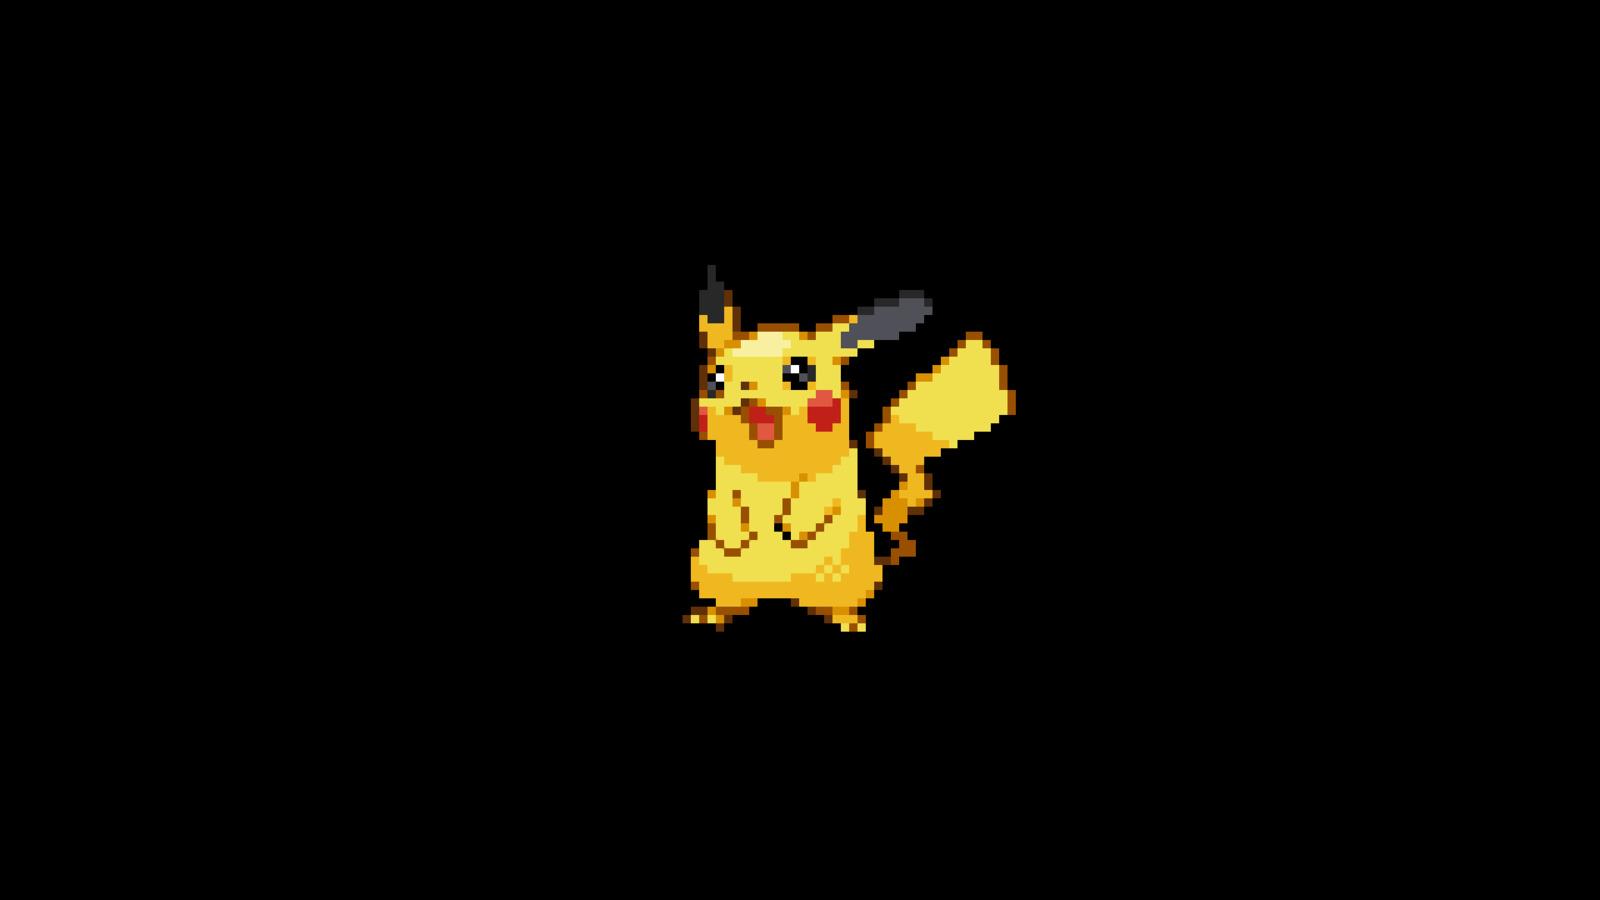 pokemon-8-bit-minimalism.jpg